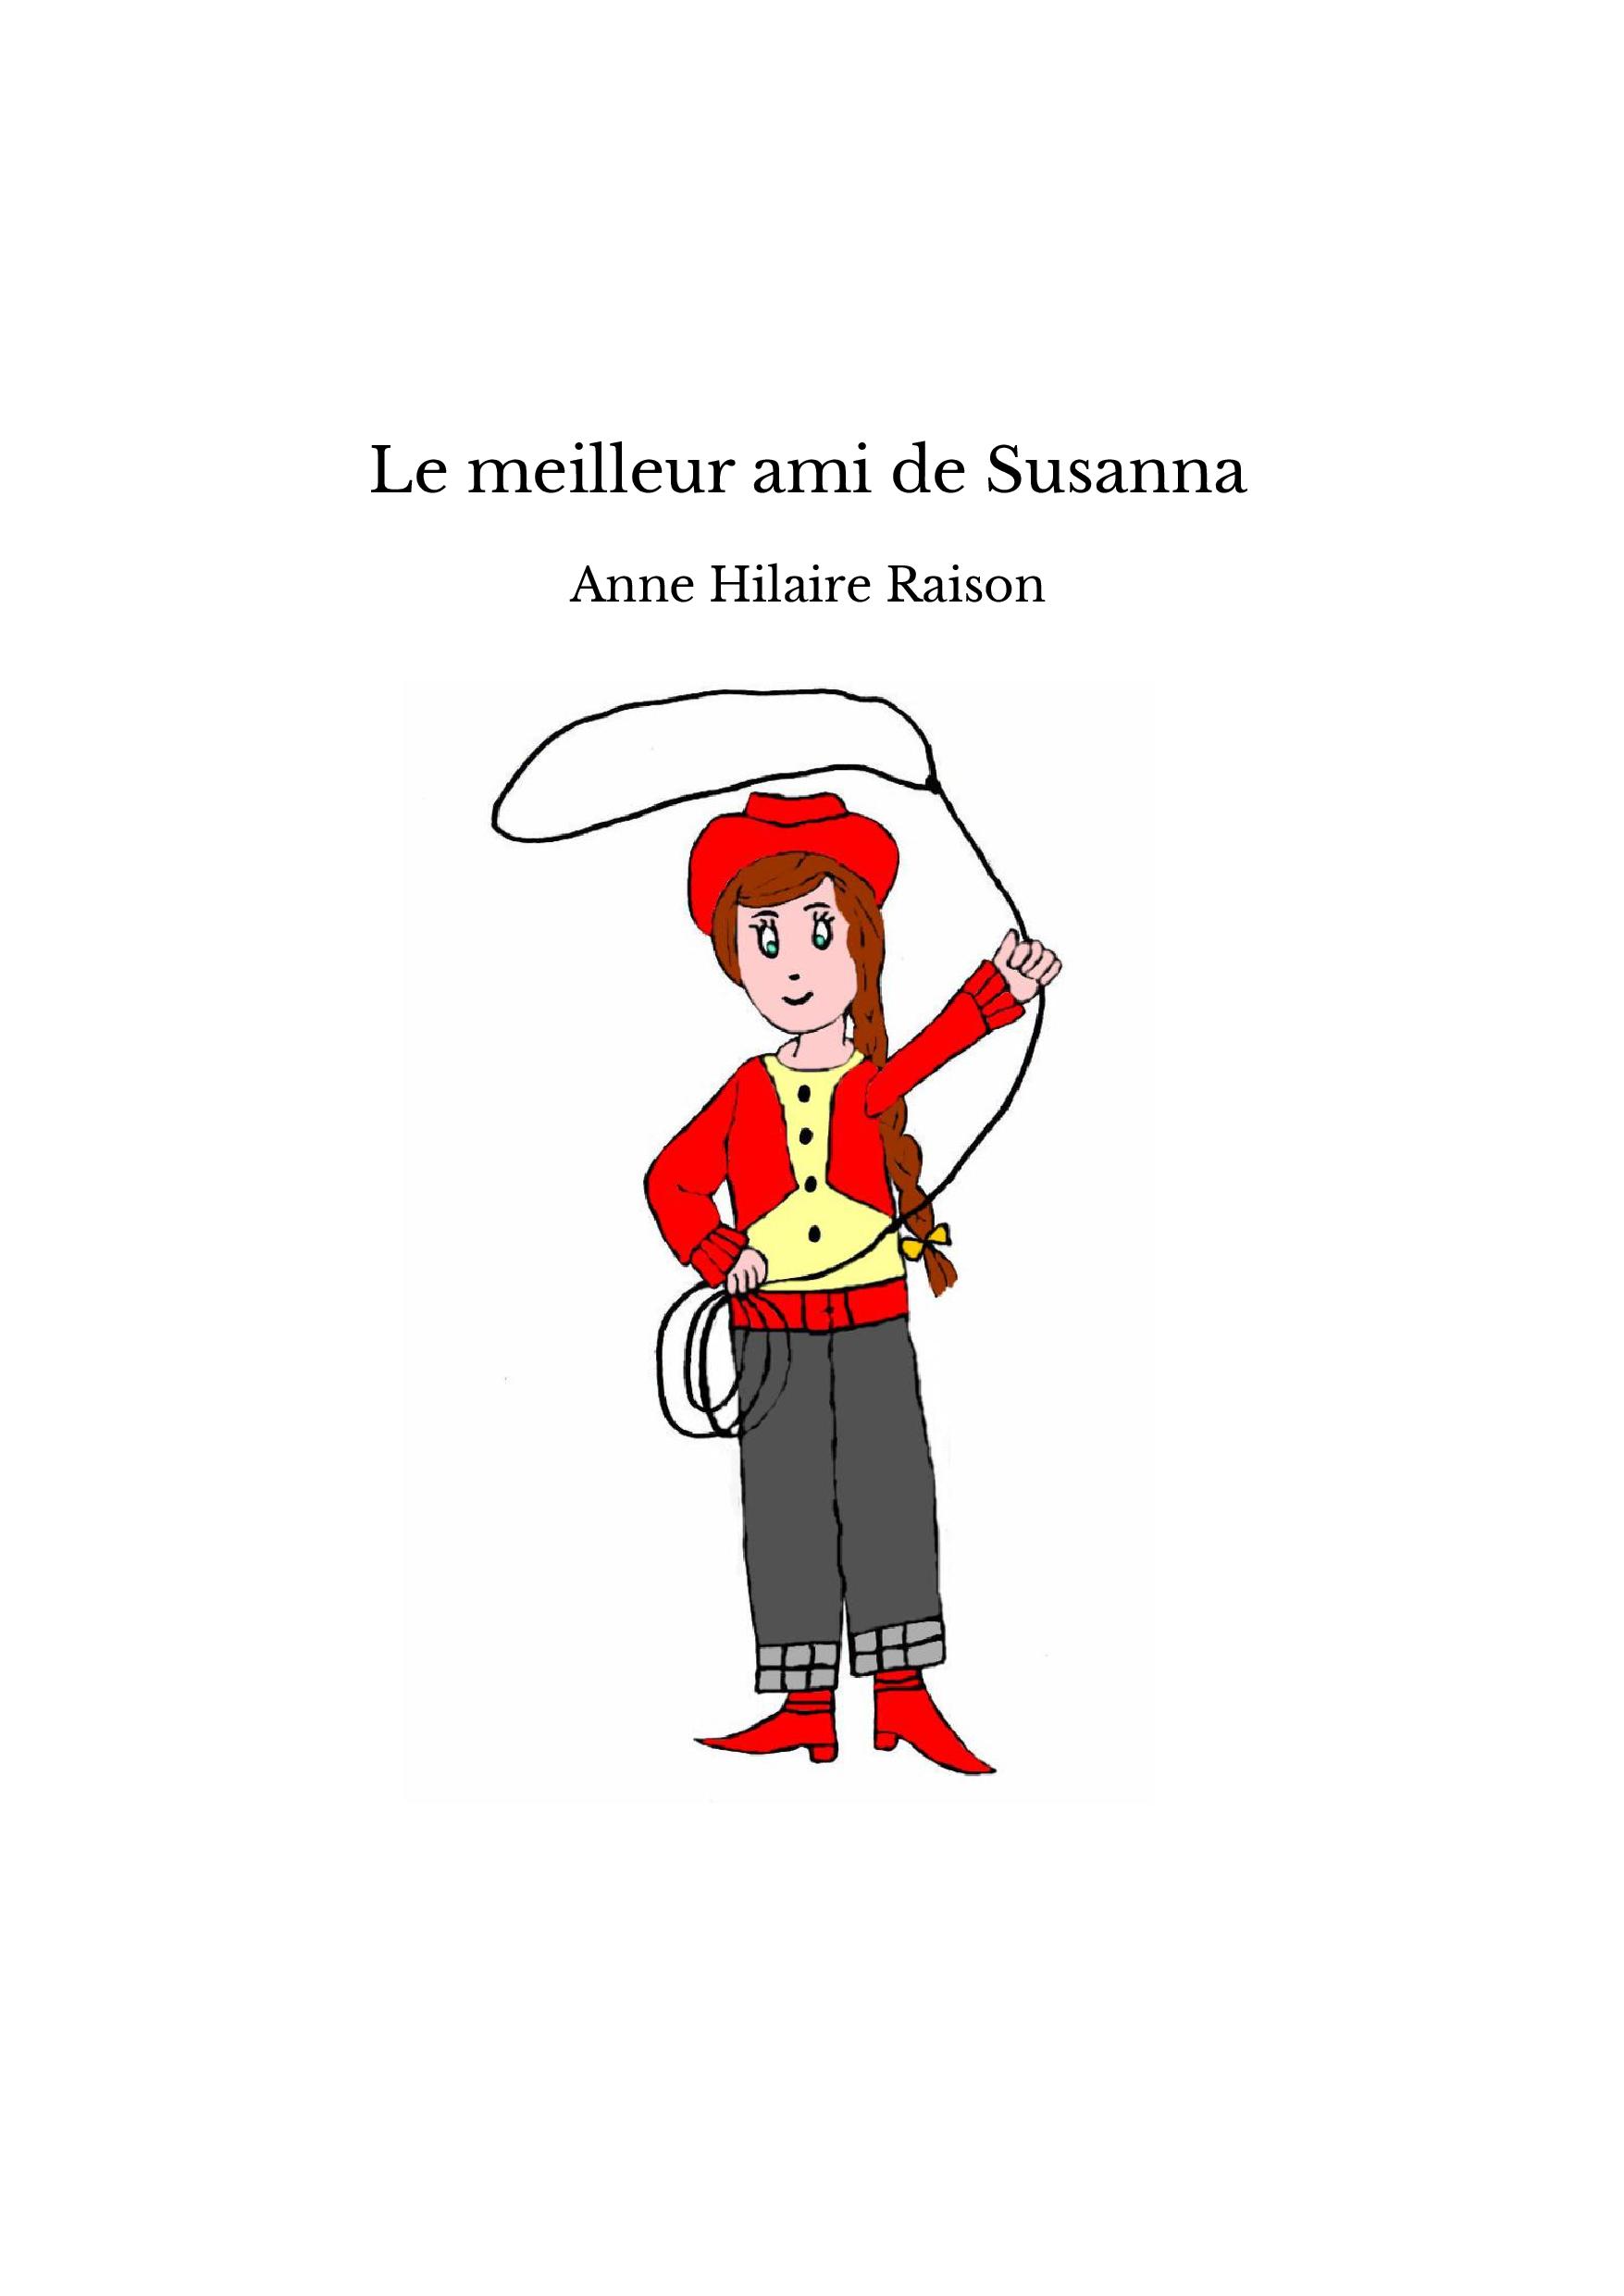 Le meilleur ami de Susanna